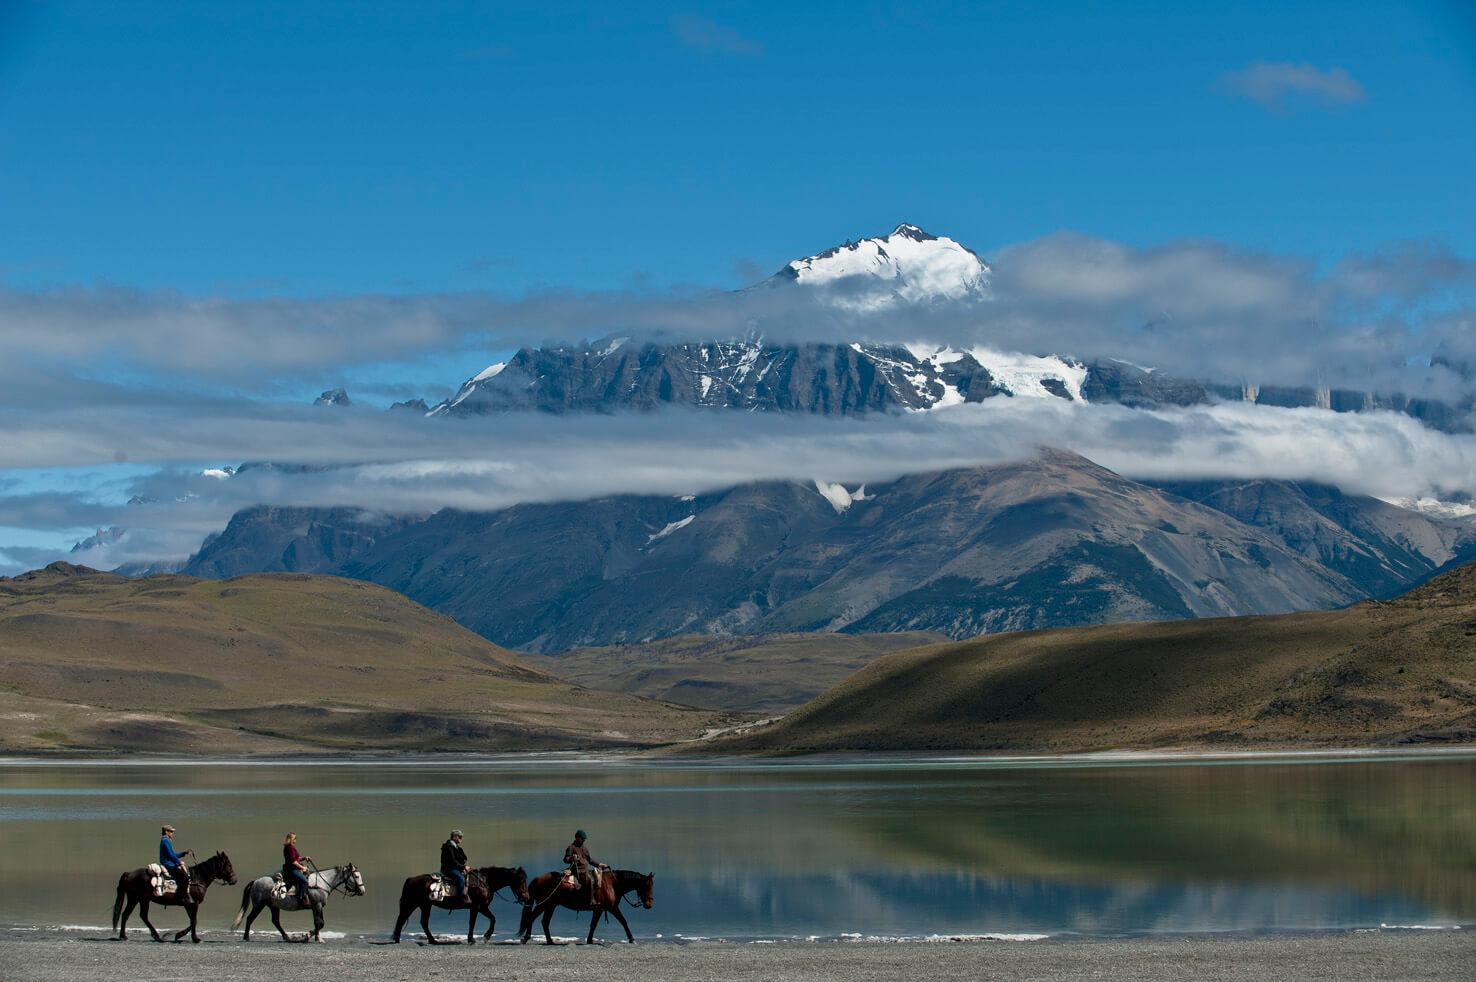 https://storage.googleapis.com/chile-travel-static-content/2016/08/Torres-del-Paine.jpg